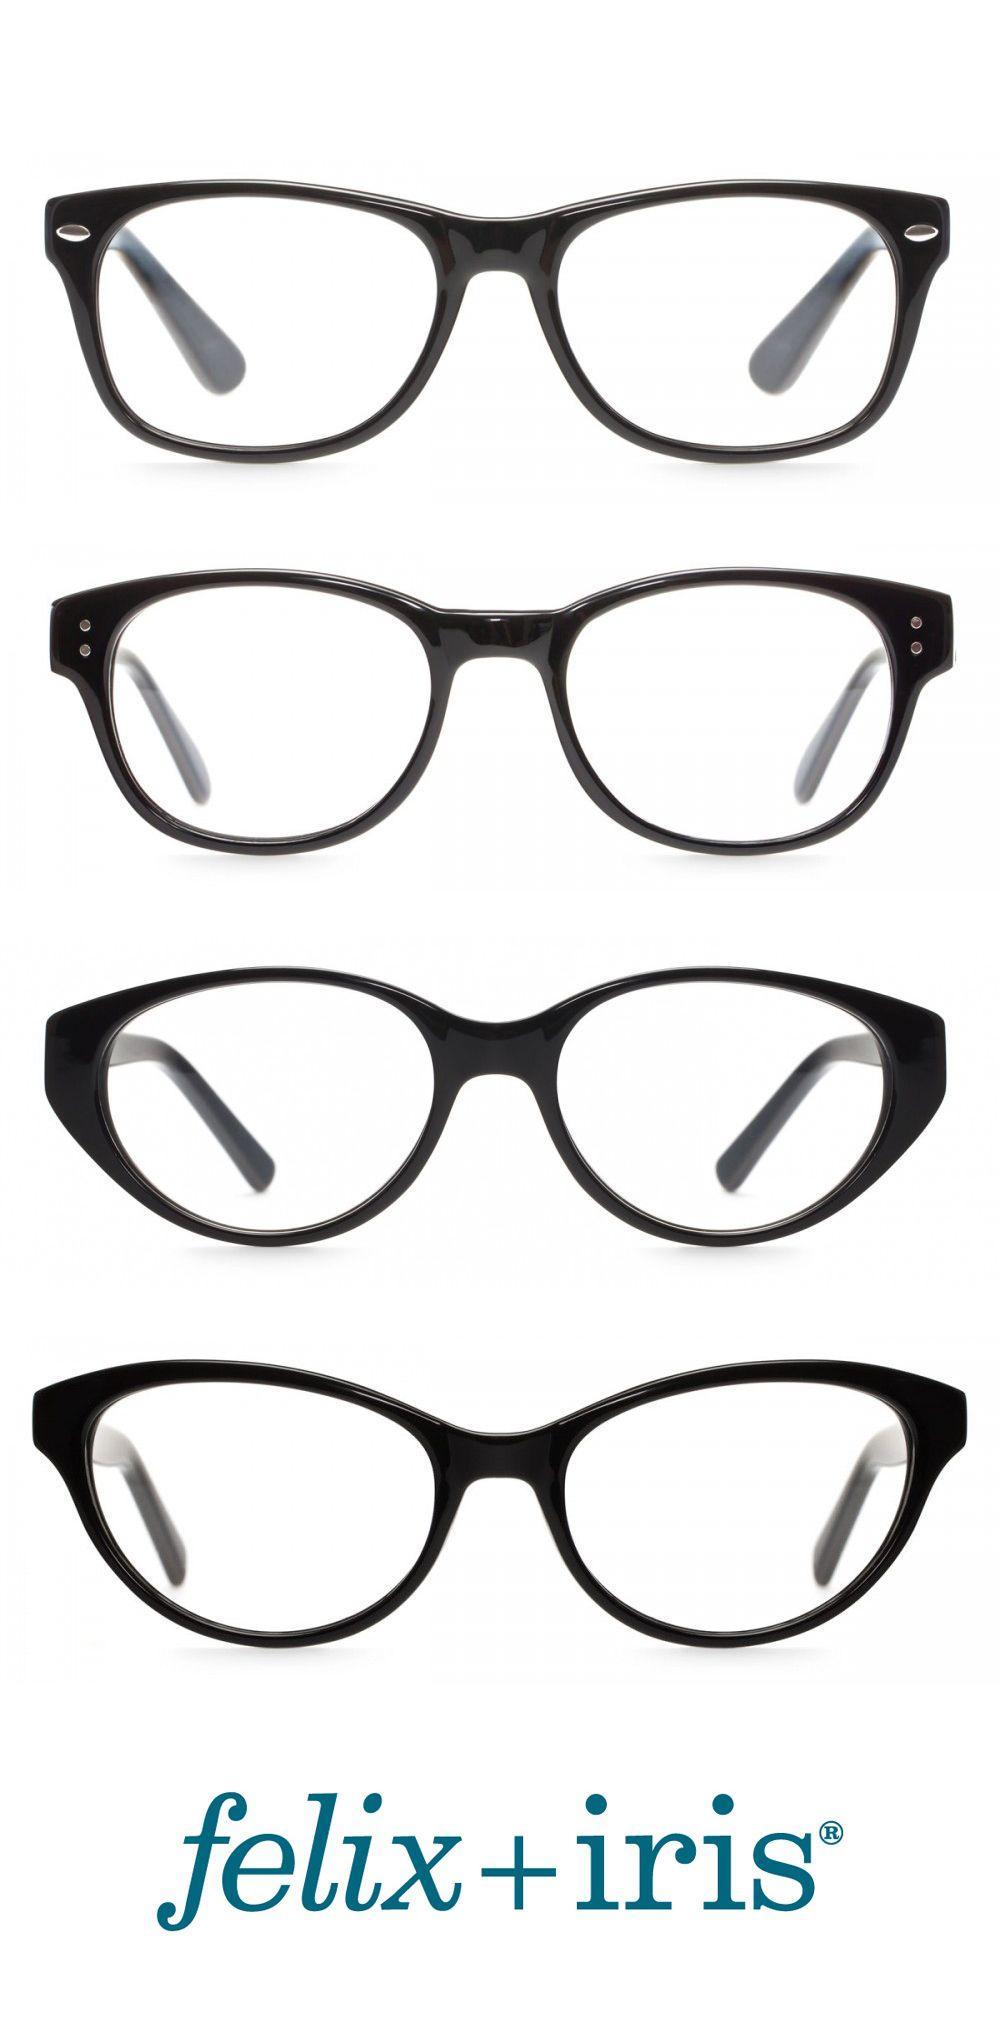 4 Fantastic Black Glasses for Heart Shaped Faces   felix + iris ...